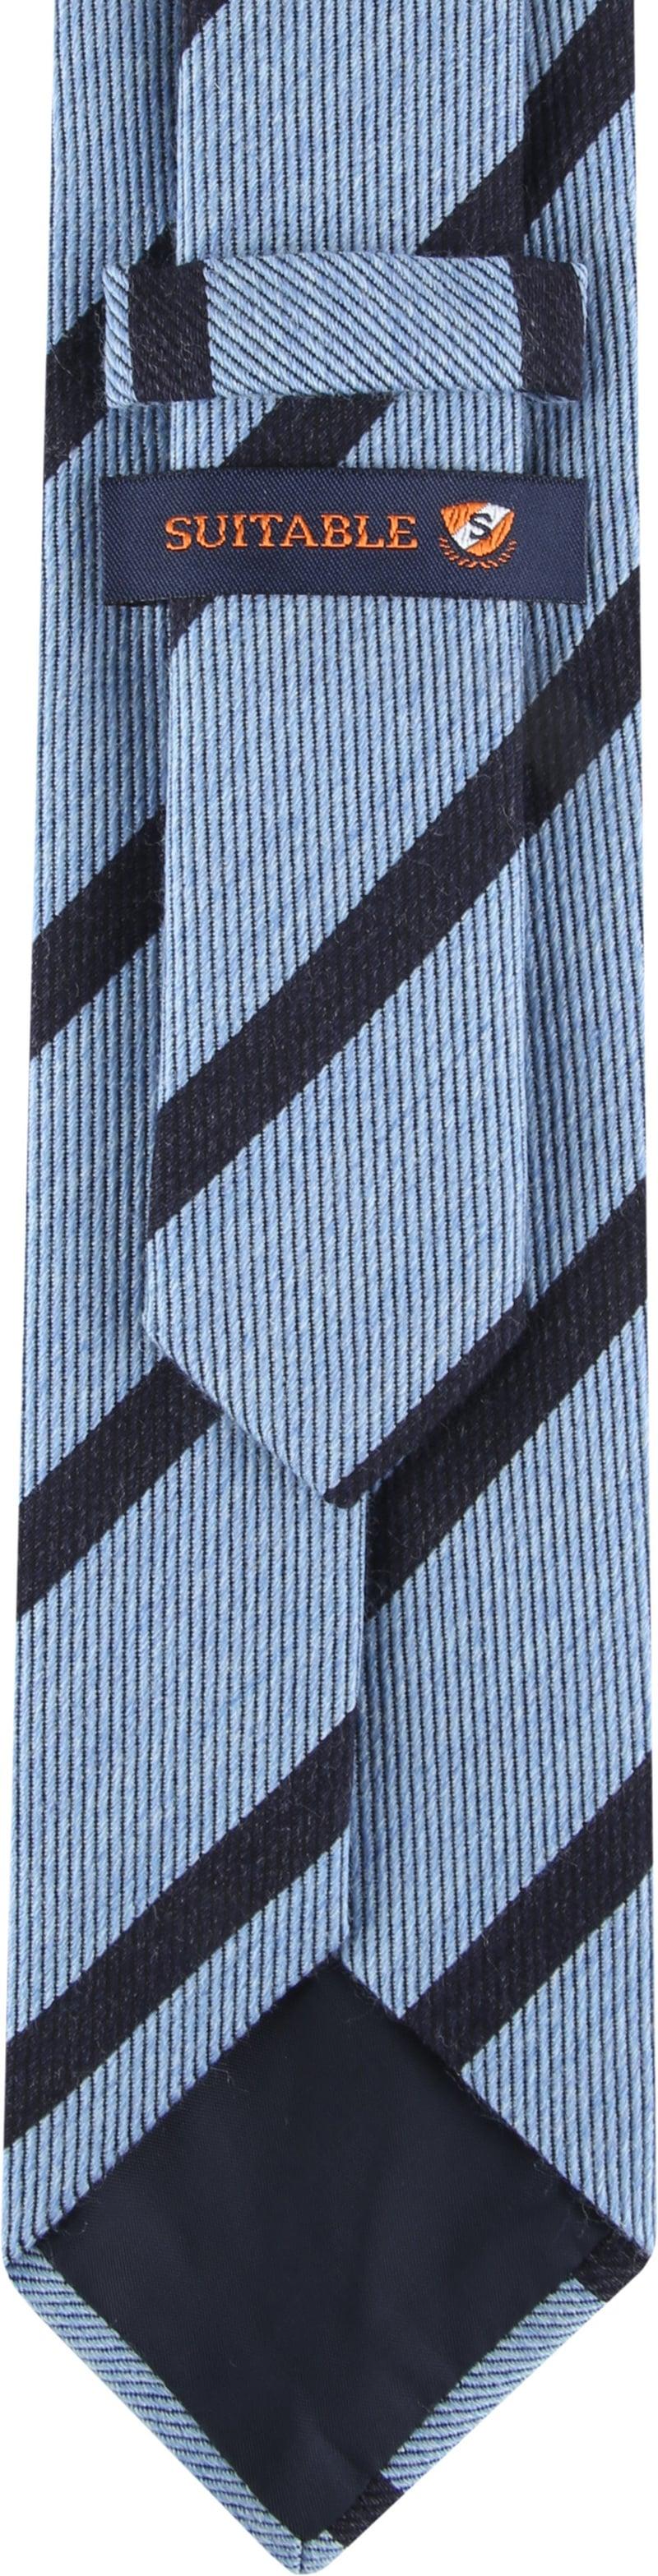 Suitable Krawatte Streifen Hellblau Foto 2